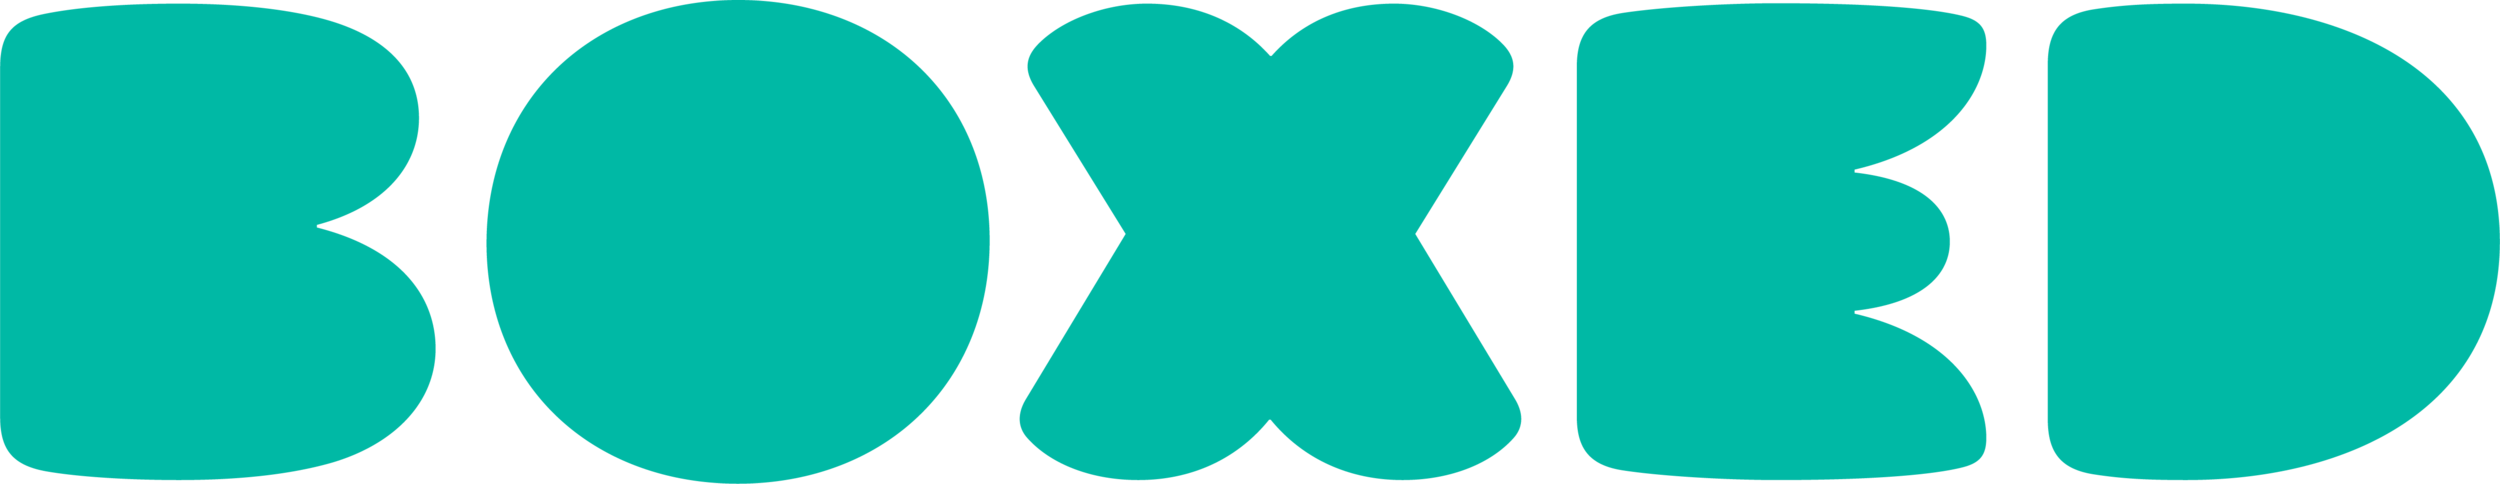 Boxed.Logo.Green.RGB.png